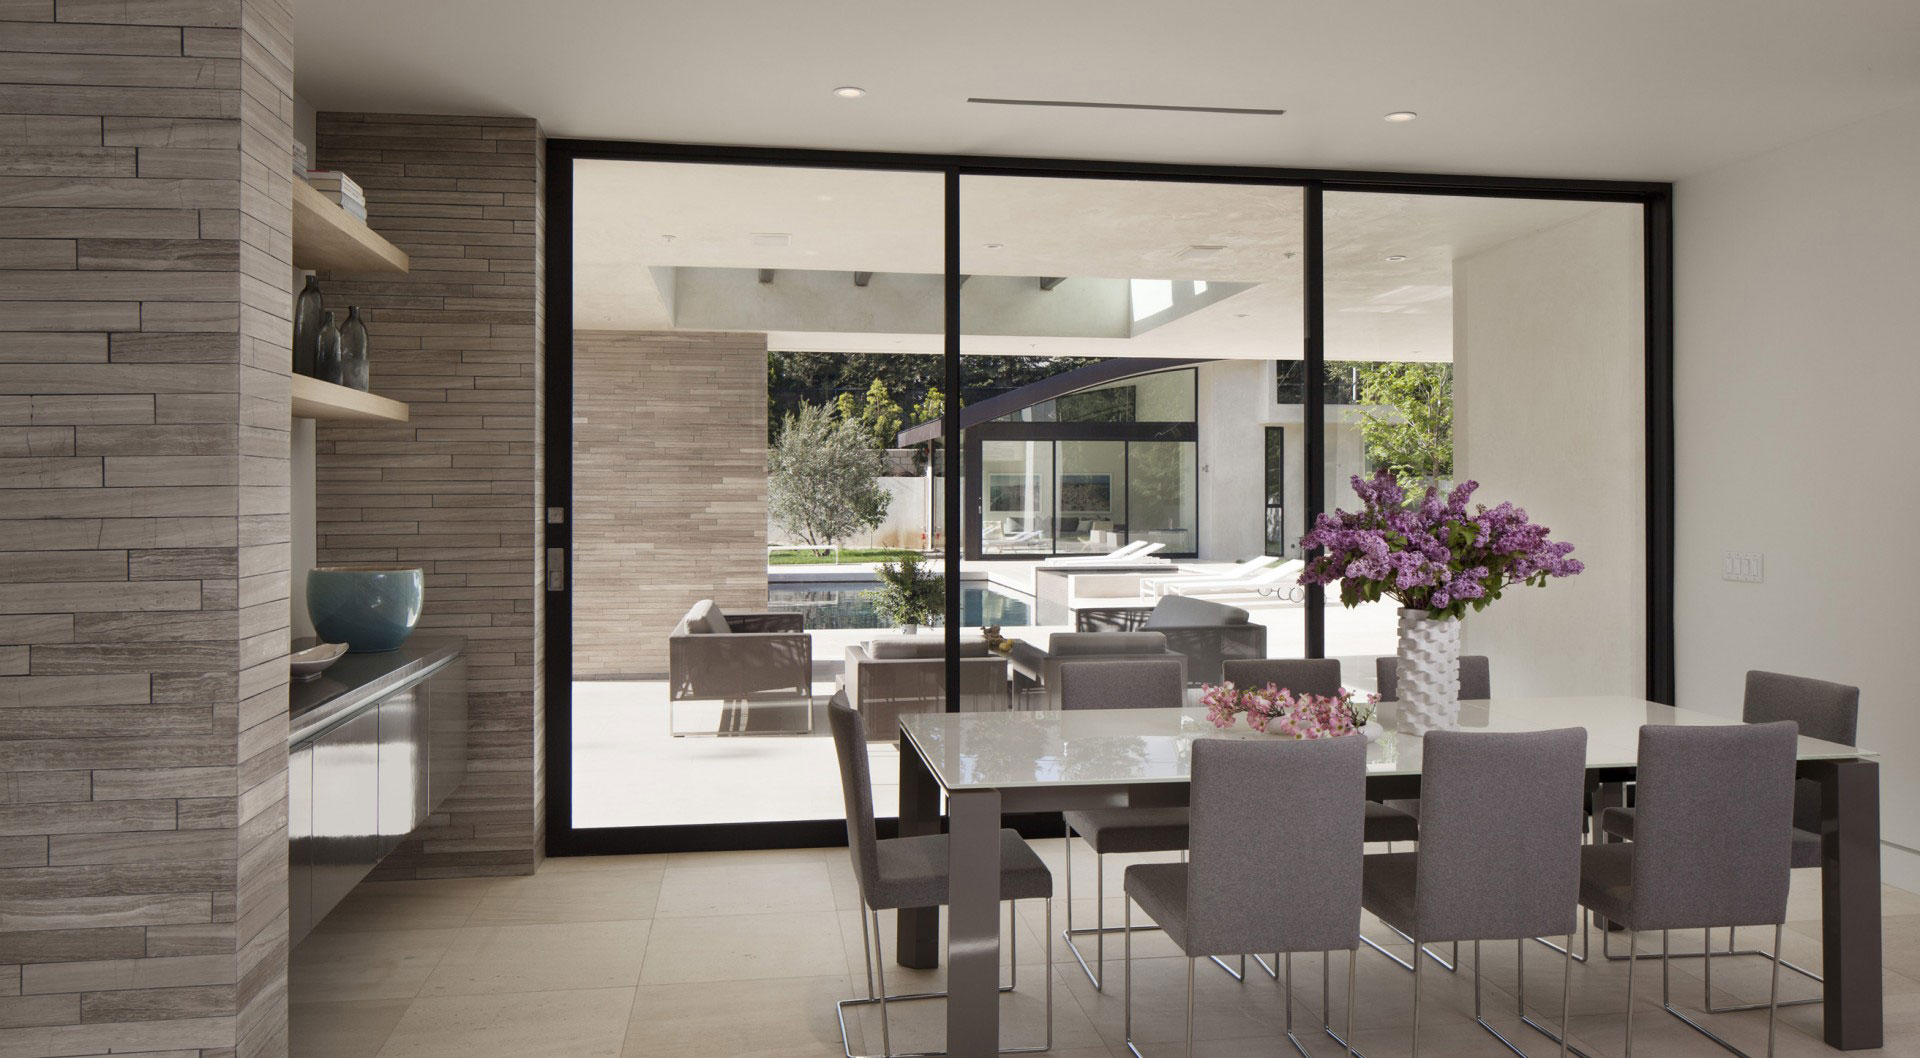 San Vicente By Mcclean Design In California Usa